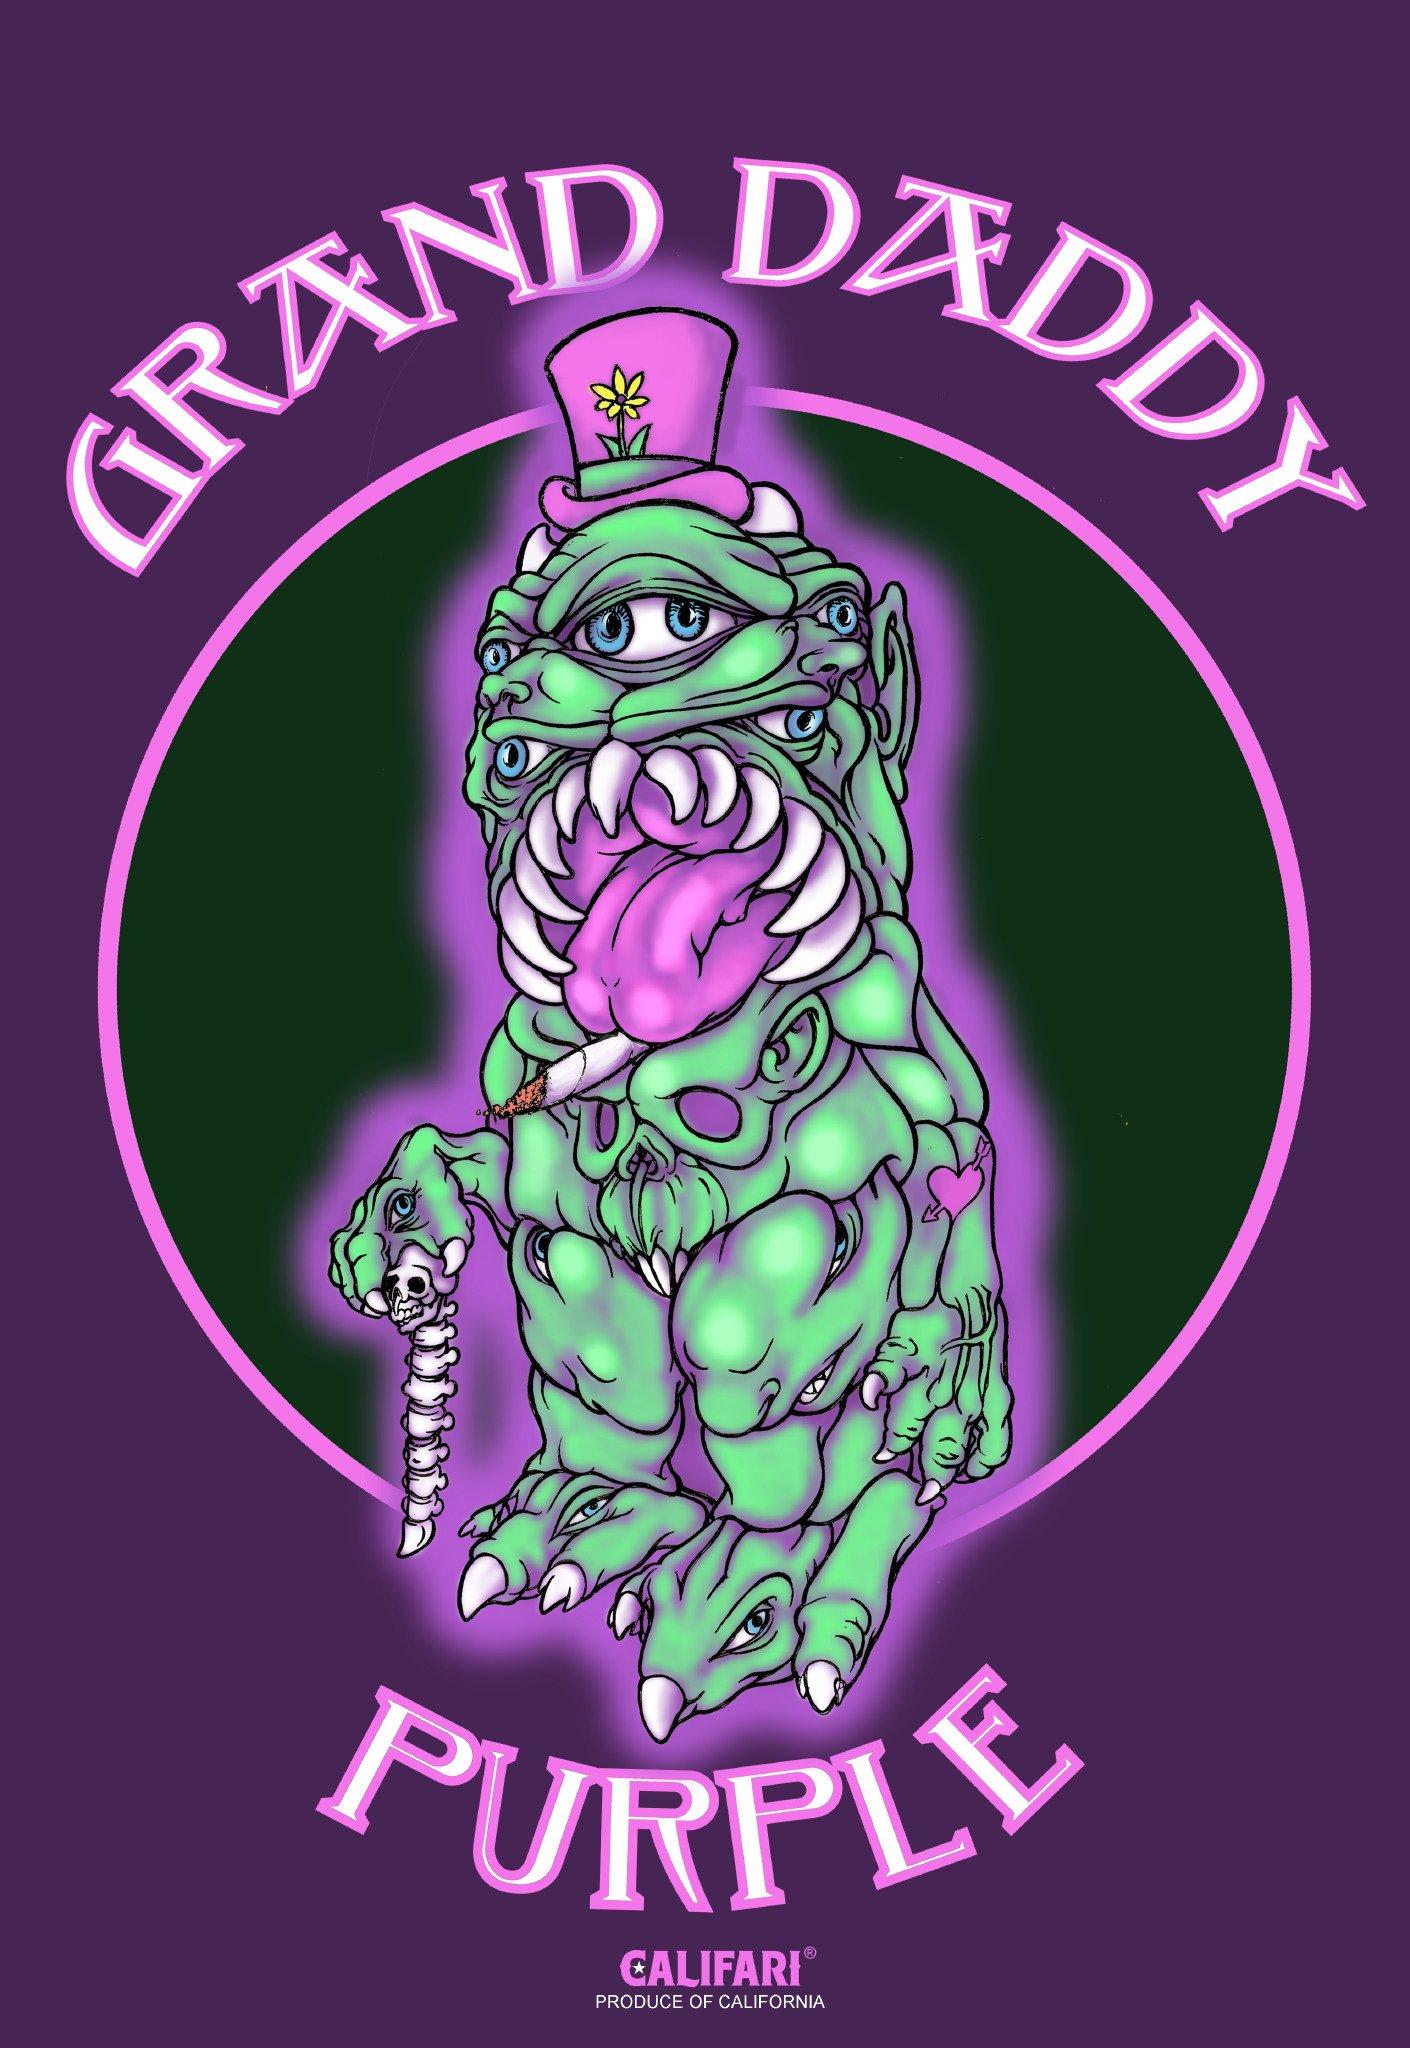 "Califari Grand Daddy Purple - Vivid Strain Art Wall Poster, Decor for a Home, Dorm, Store, Dispensary, or Smoke Shop - 13"" x 19"" Lithograph Print"